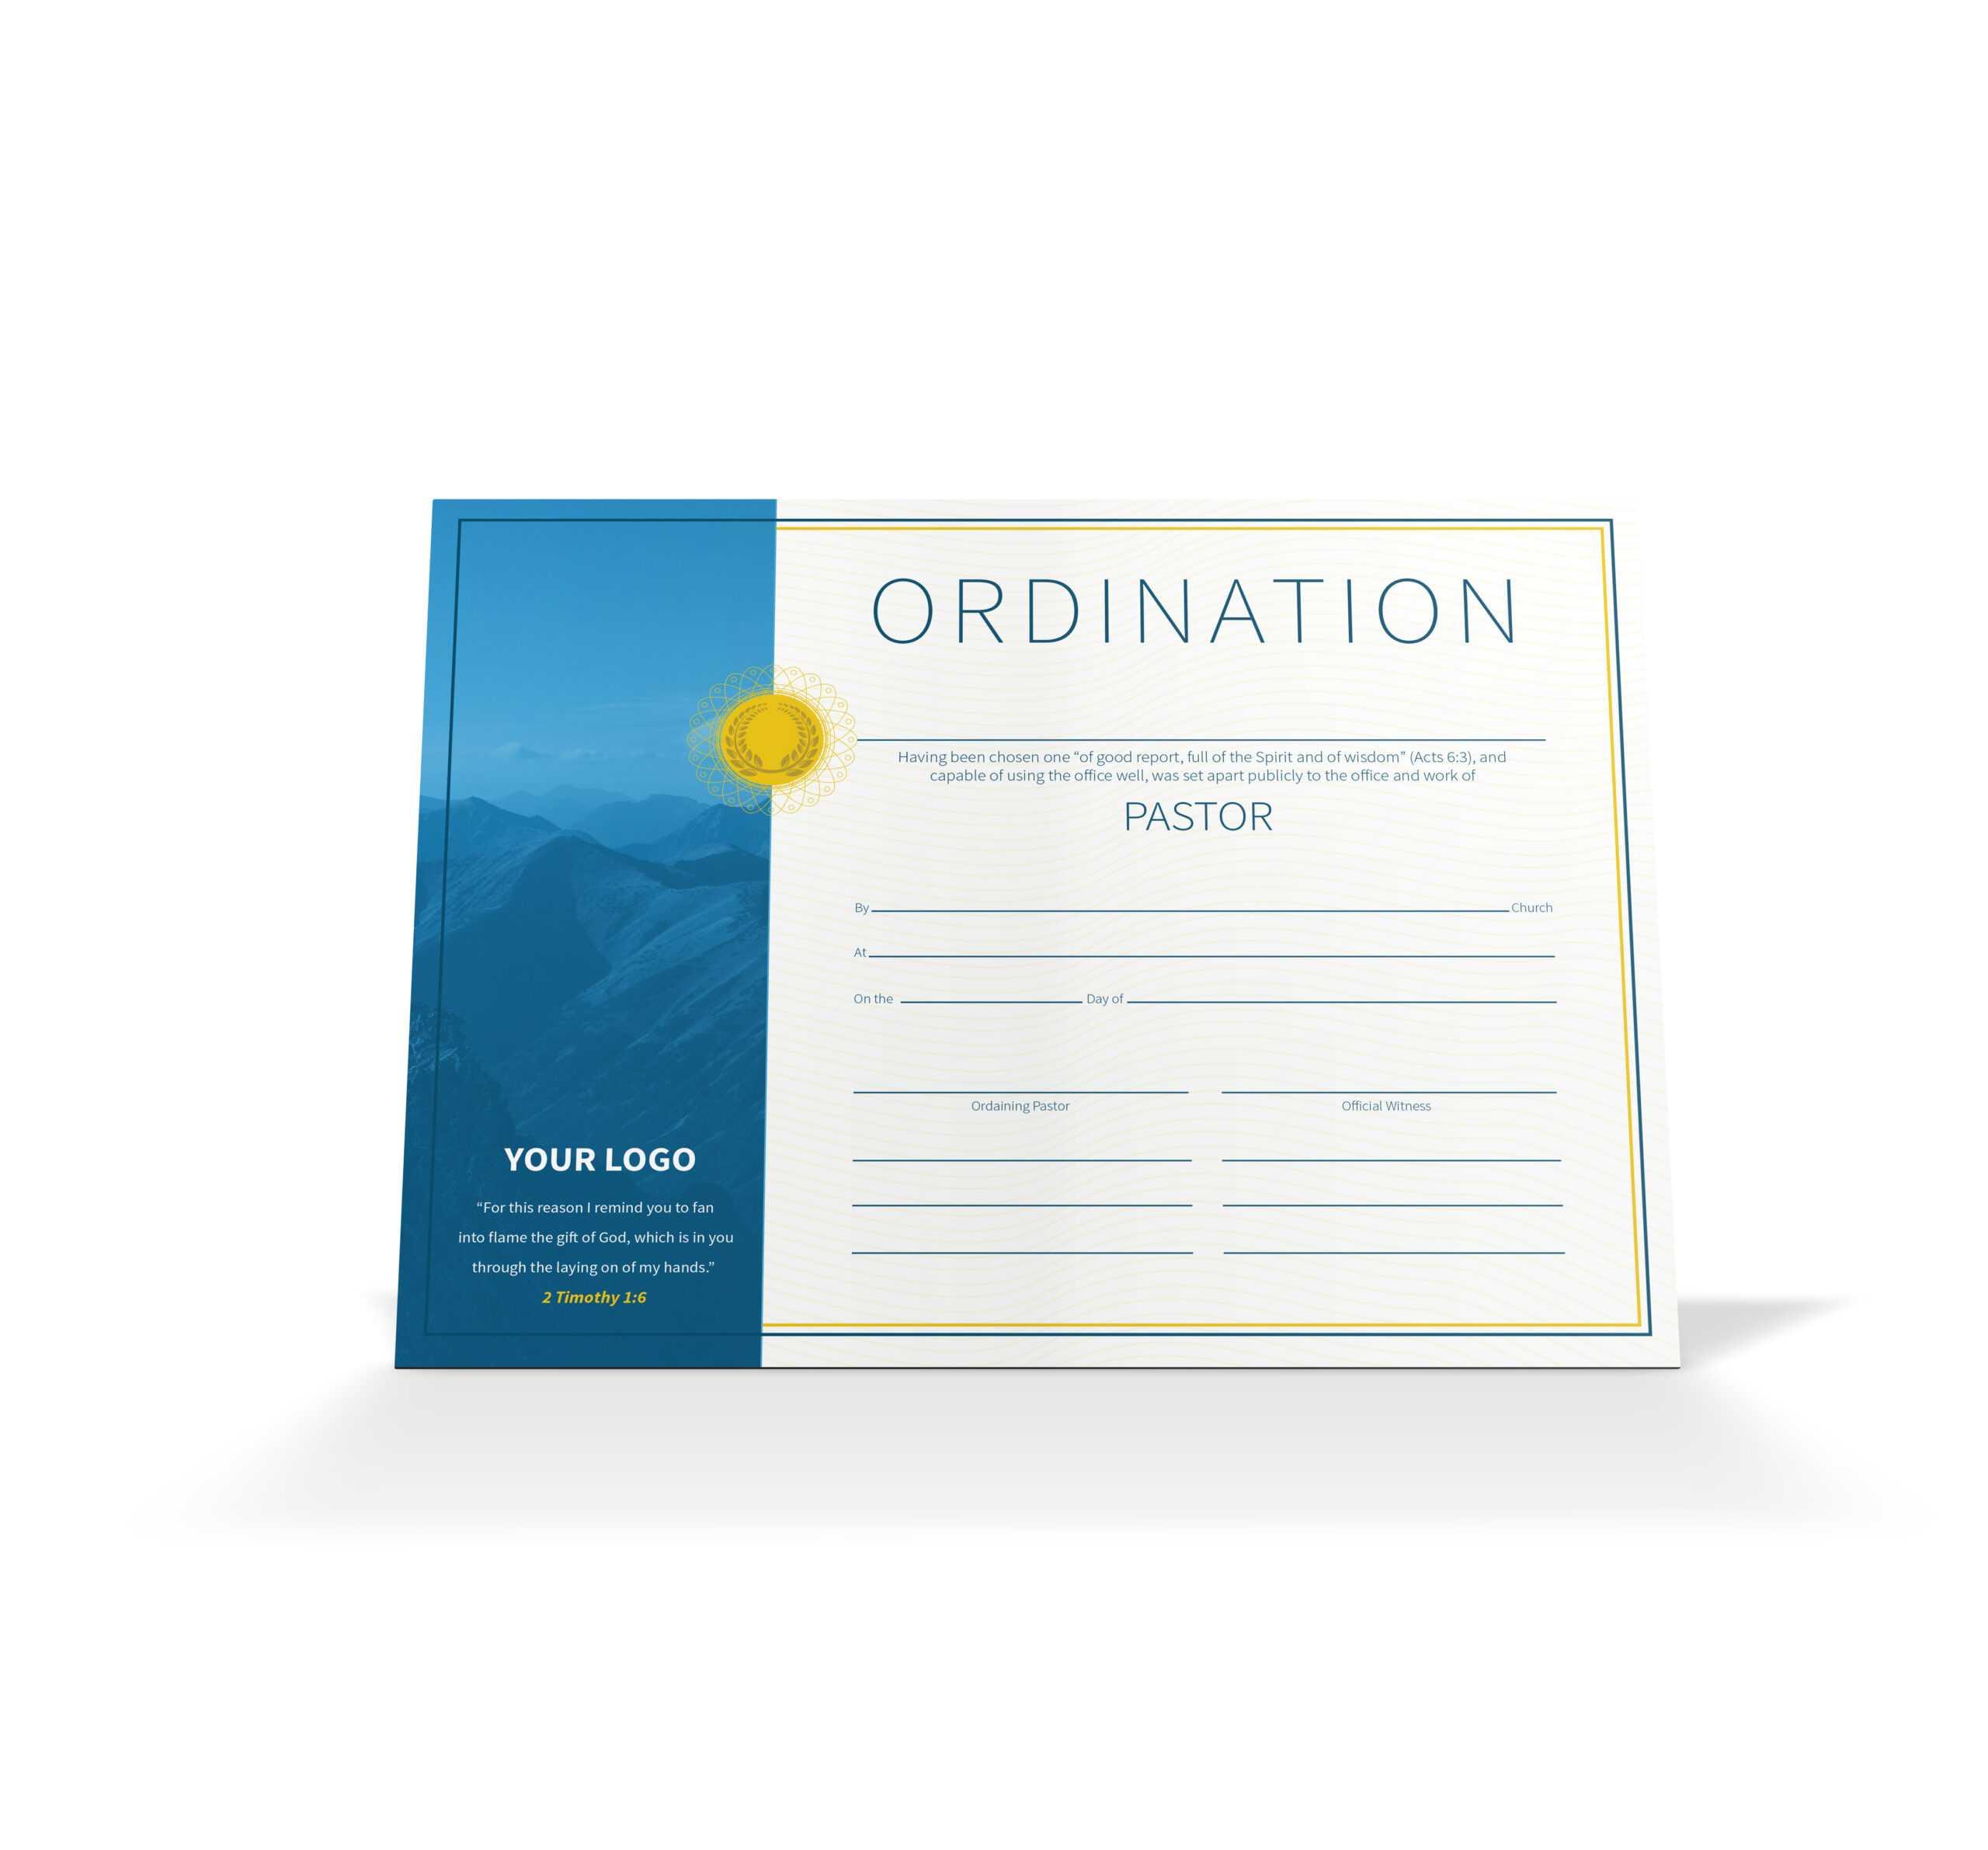 Pastor Ordination Certificate – Vineyard Digital Membership Regarding Ordination Certificate Templates